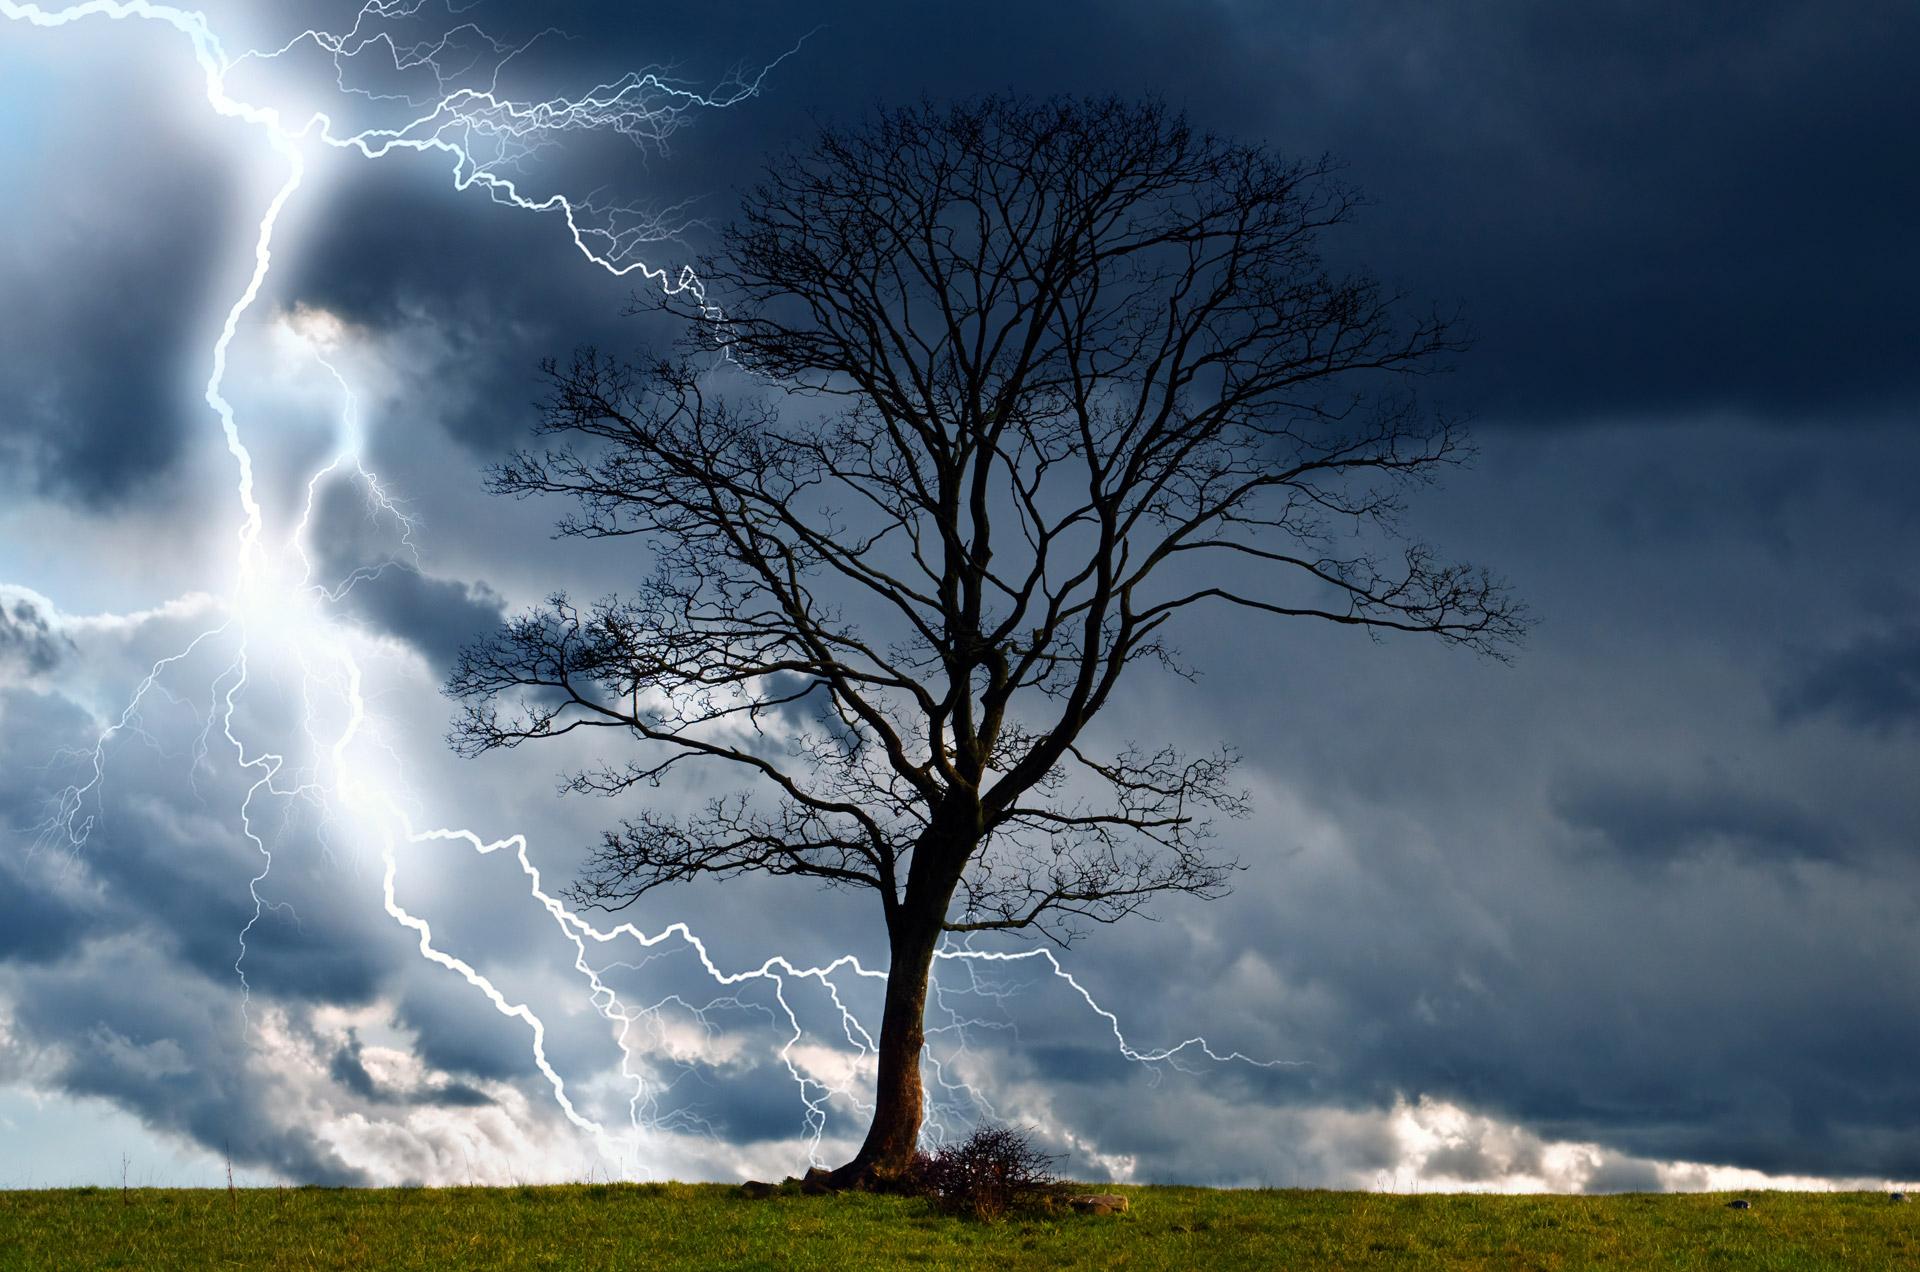 tree storm image